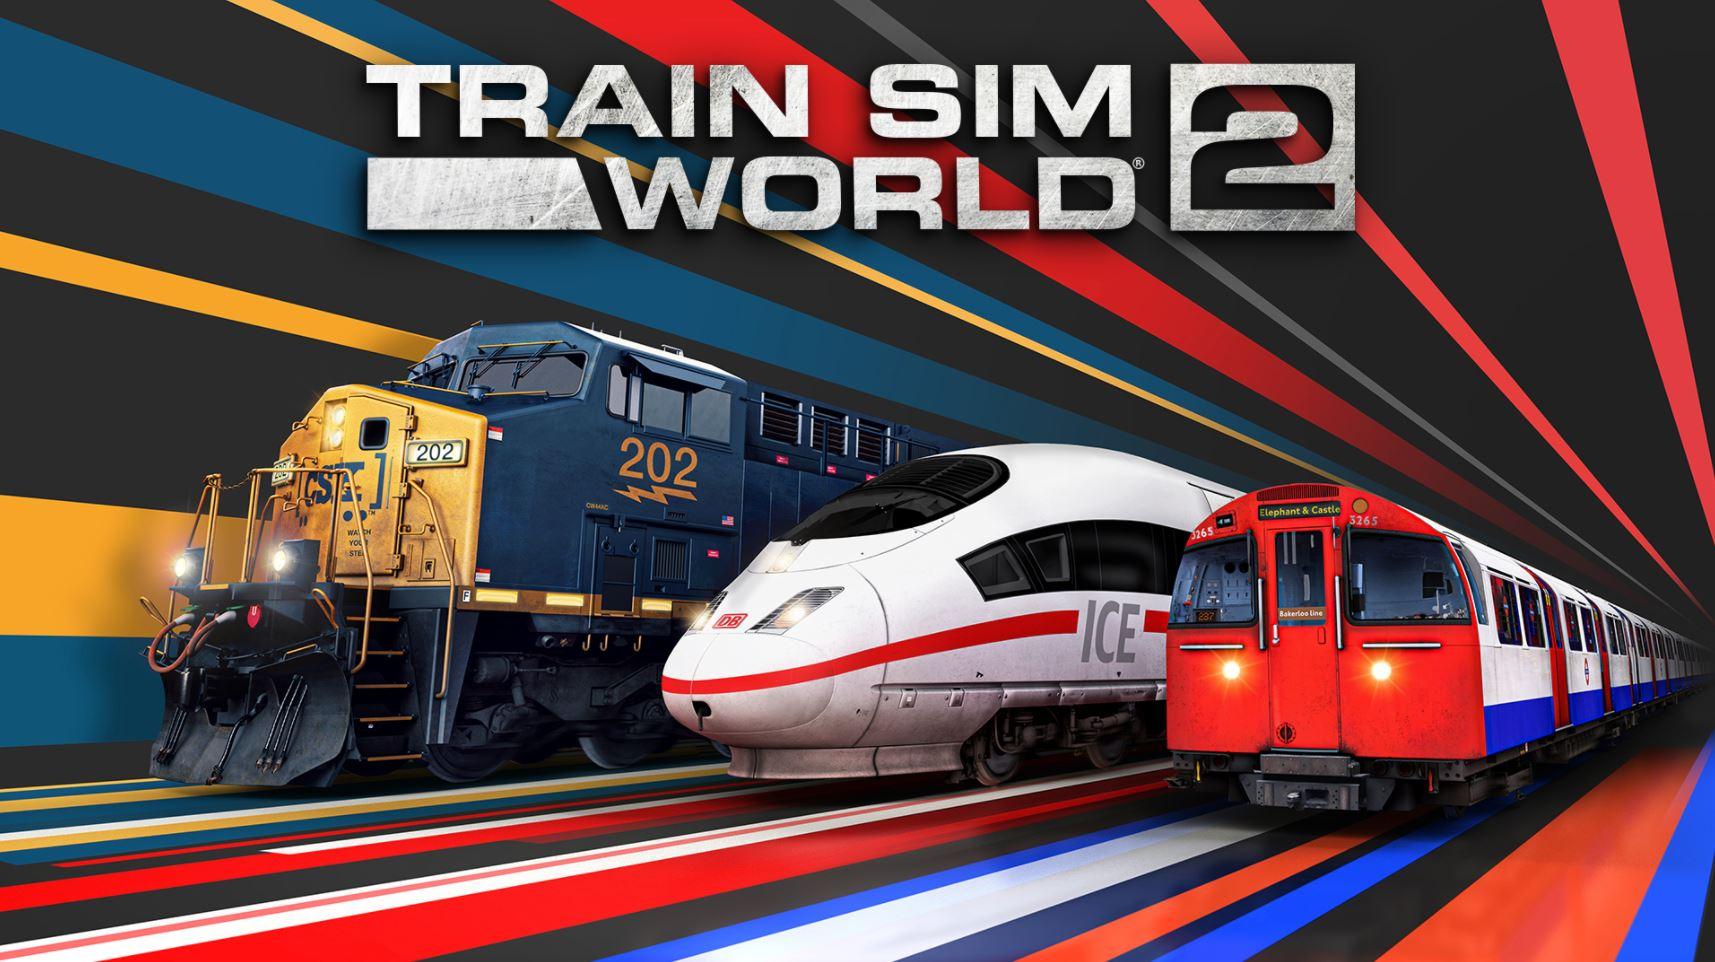 train-sim-world-2-ps5-ps4-news-reviews-videos